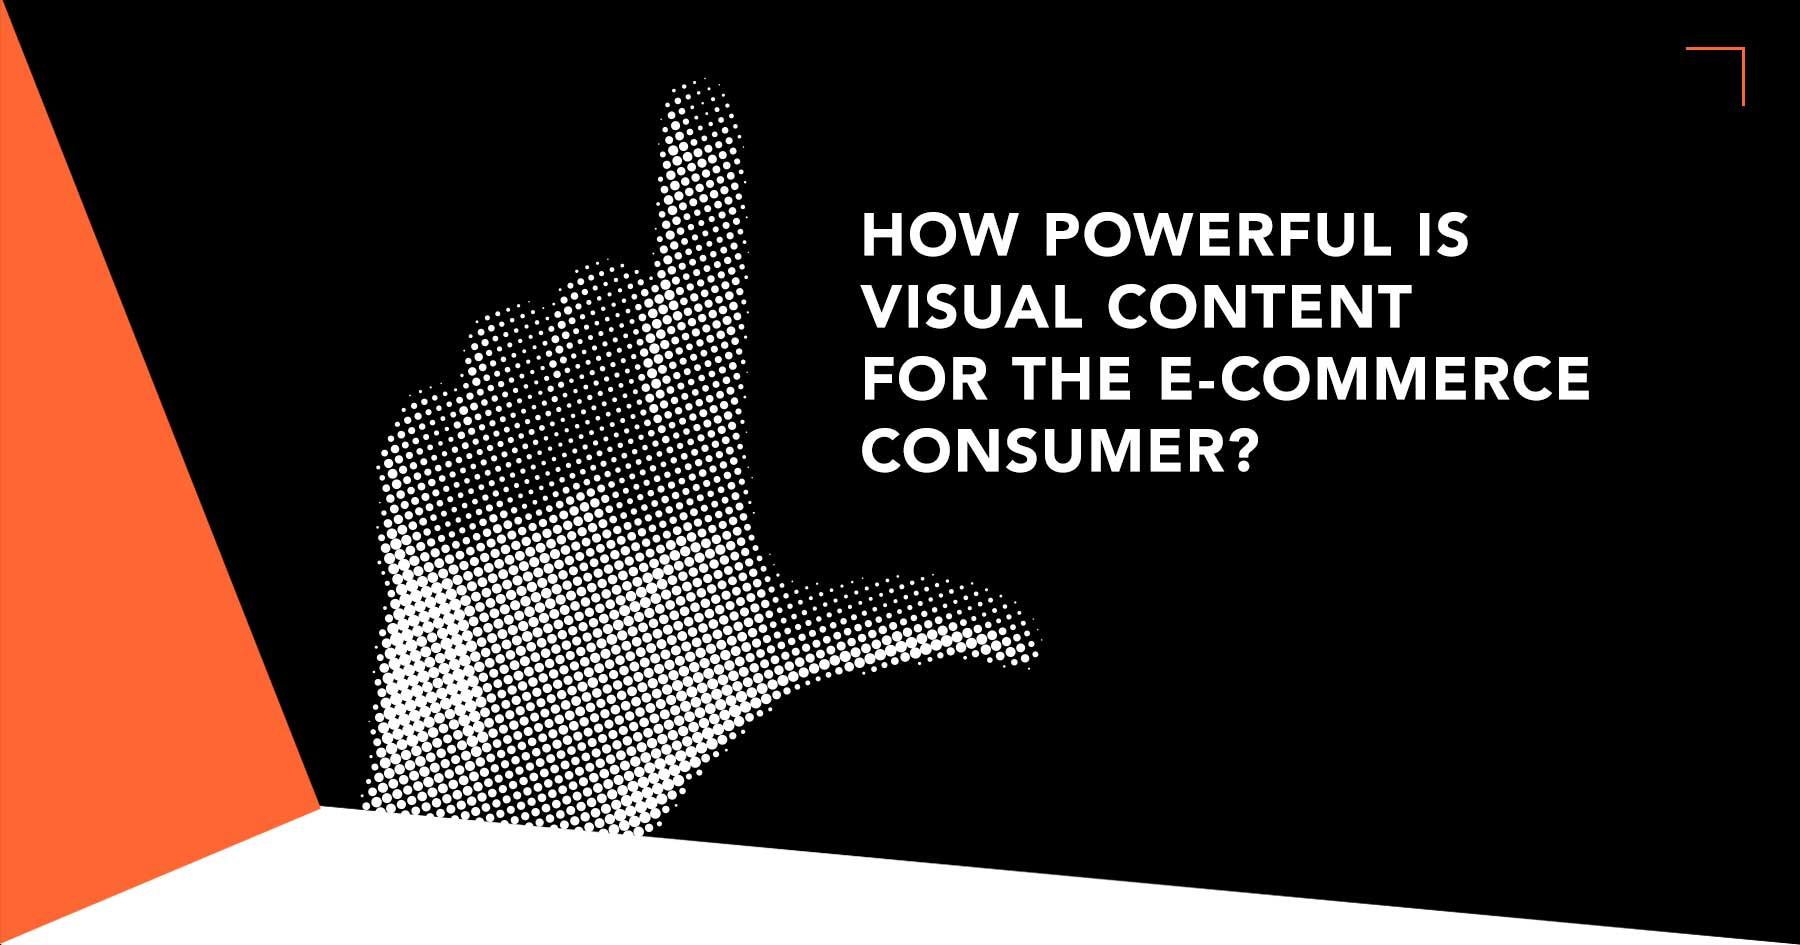 powerful-visual-content-e-commerce-consumer